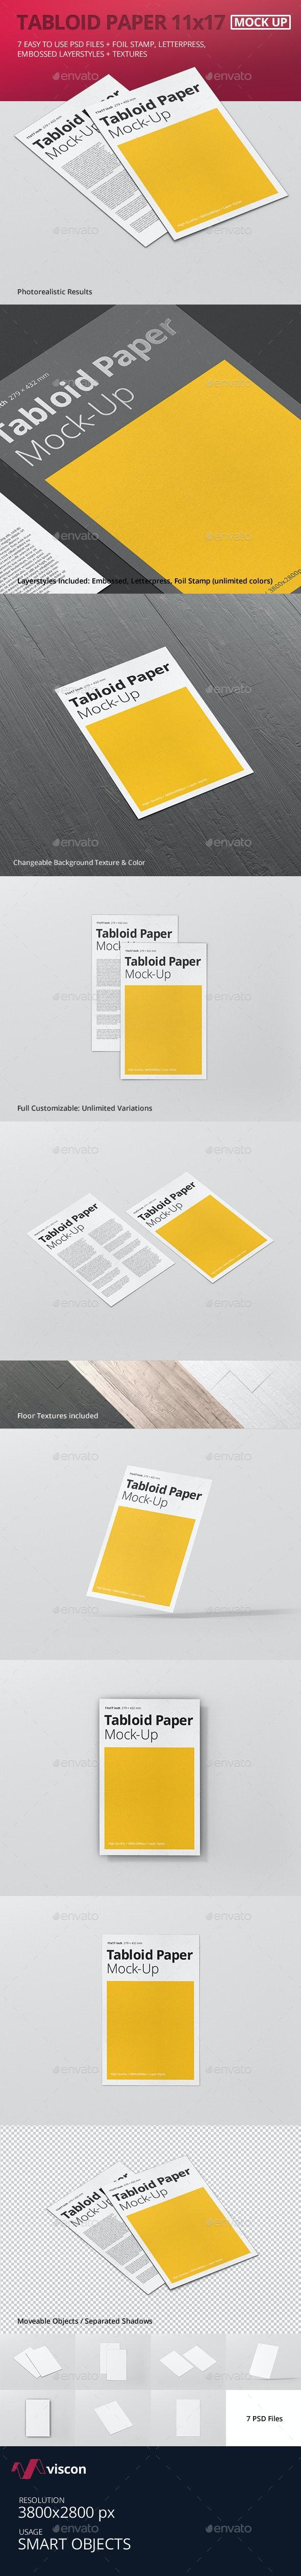 Tabloid Paper Mock-Up - 11x17 - Flyers Print